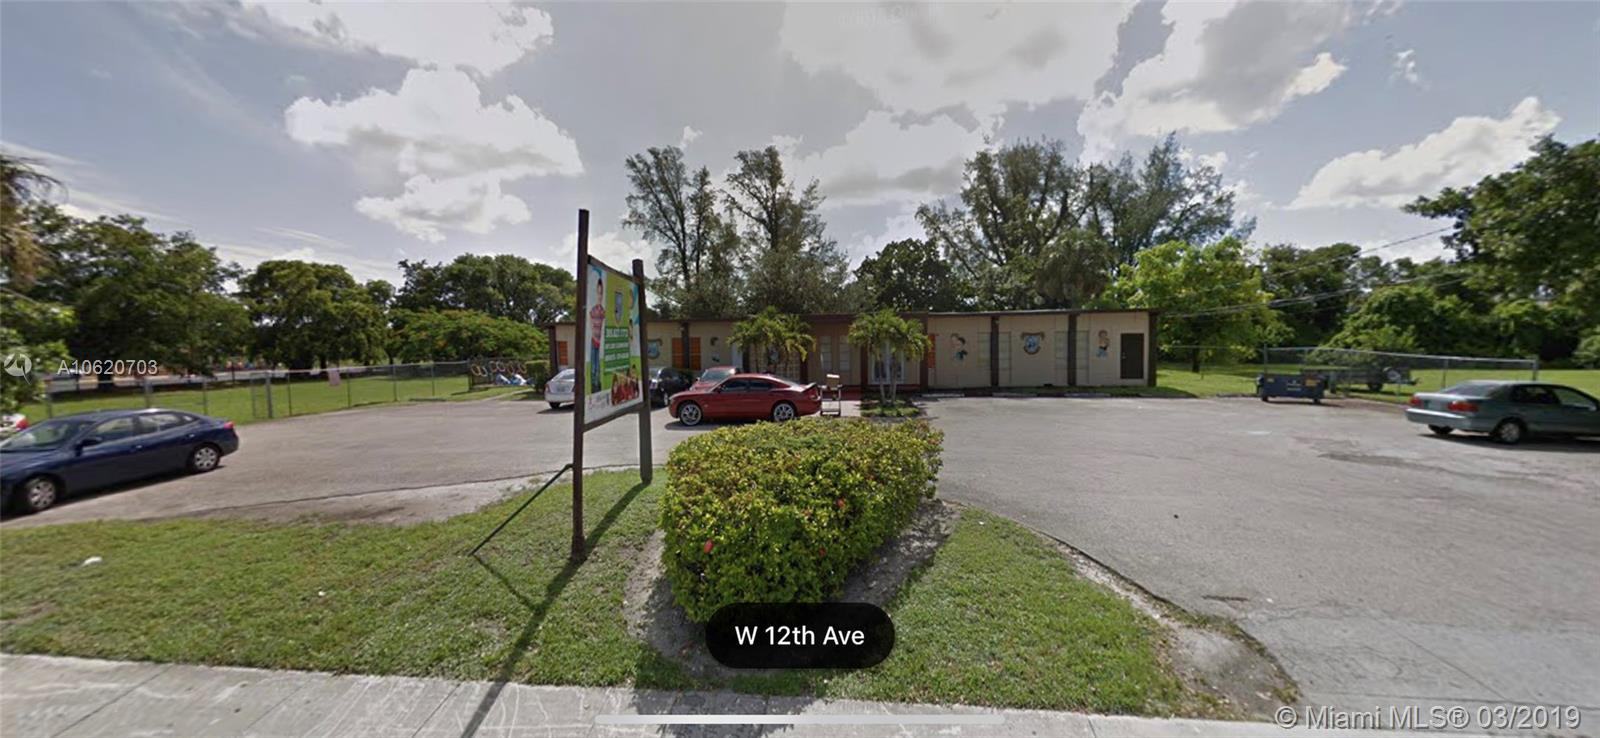 8155 W 12th Ave, Hialeah, FL 33014